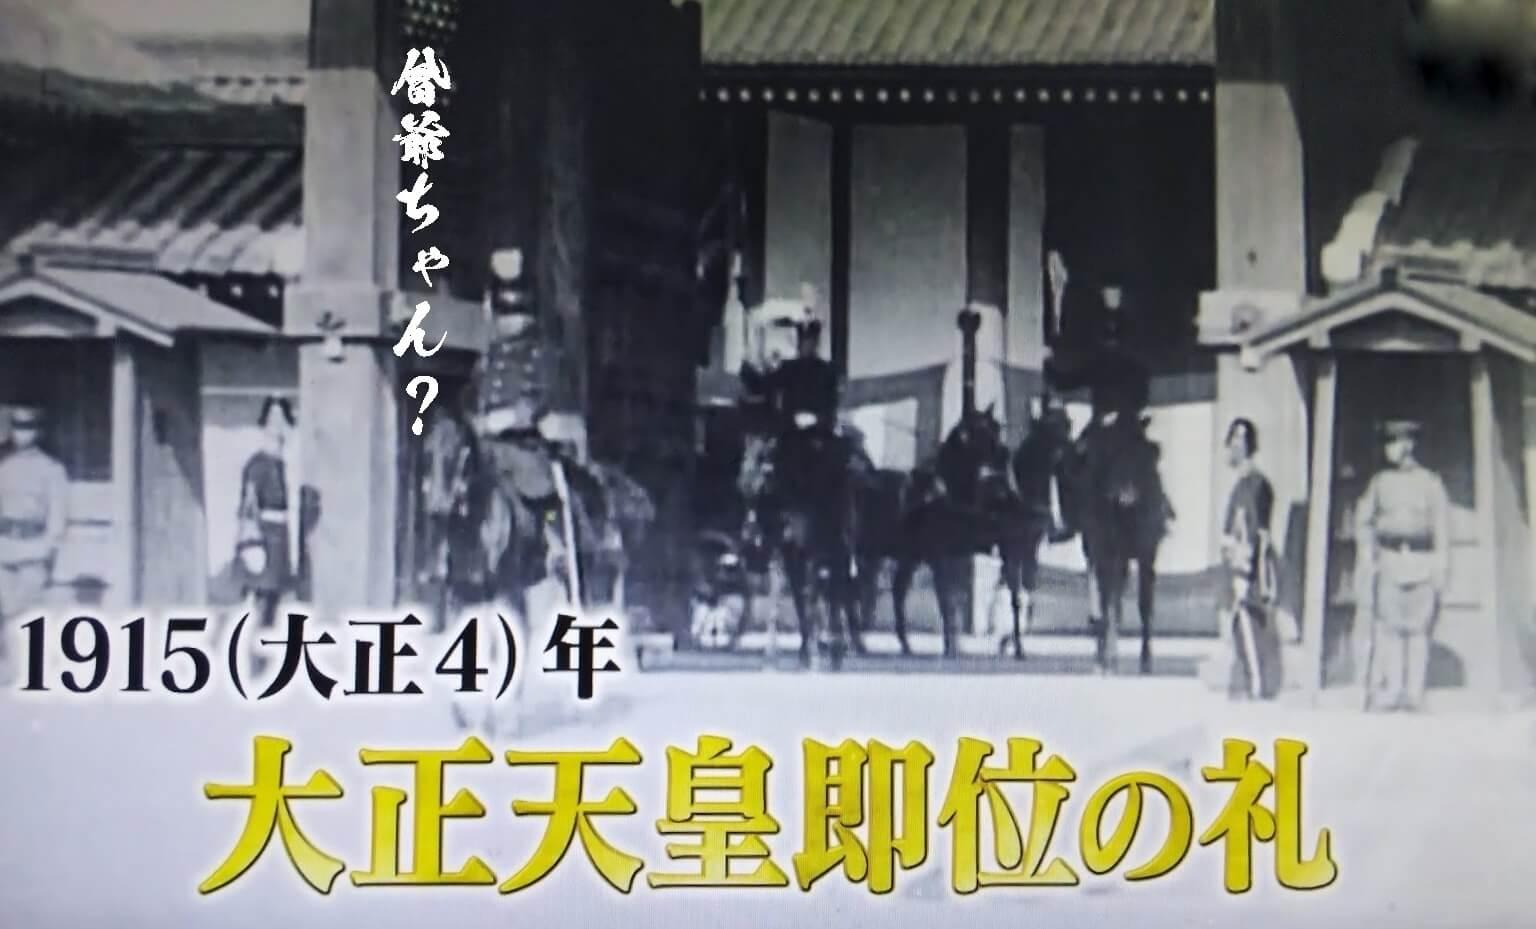 1914年 大正天皇即位の礼